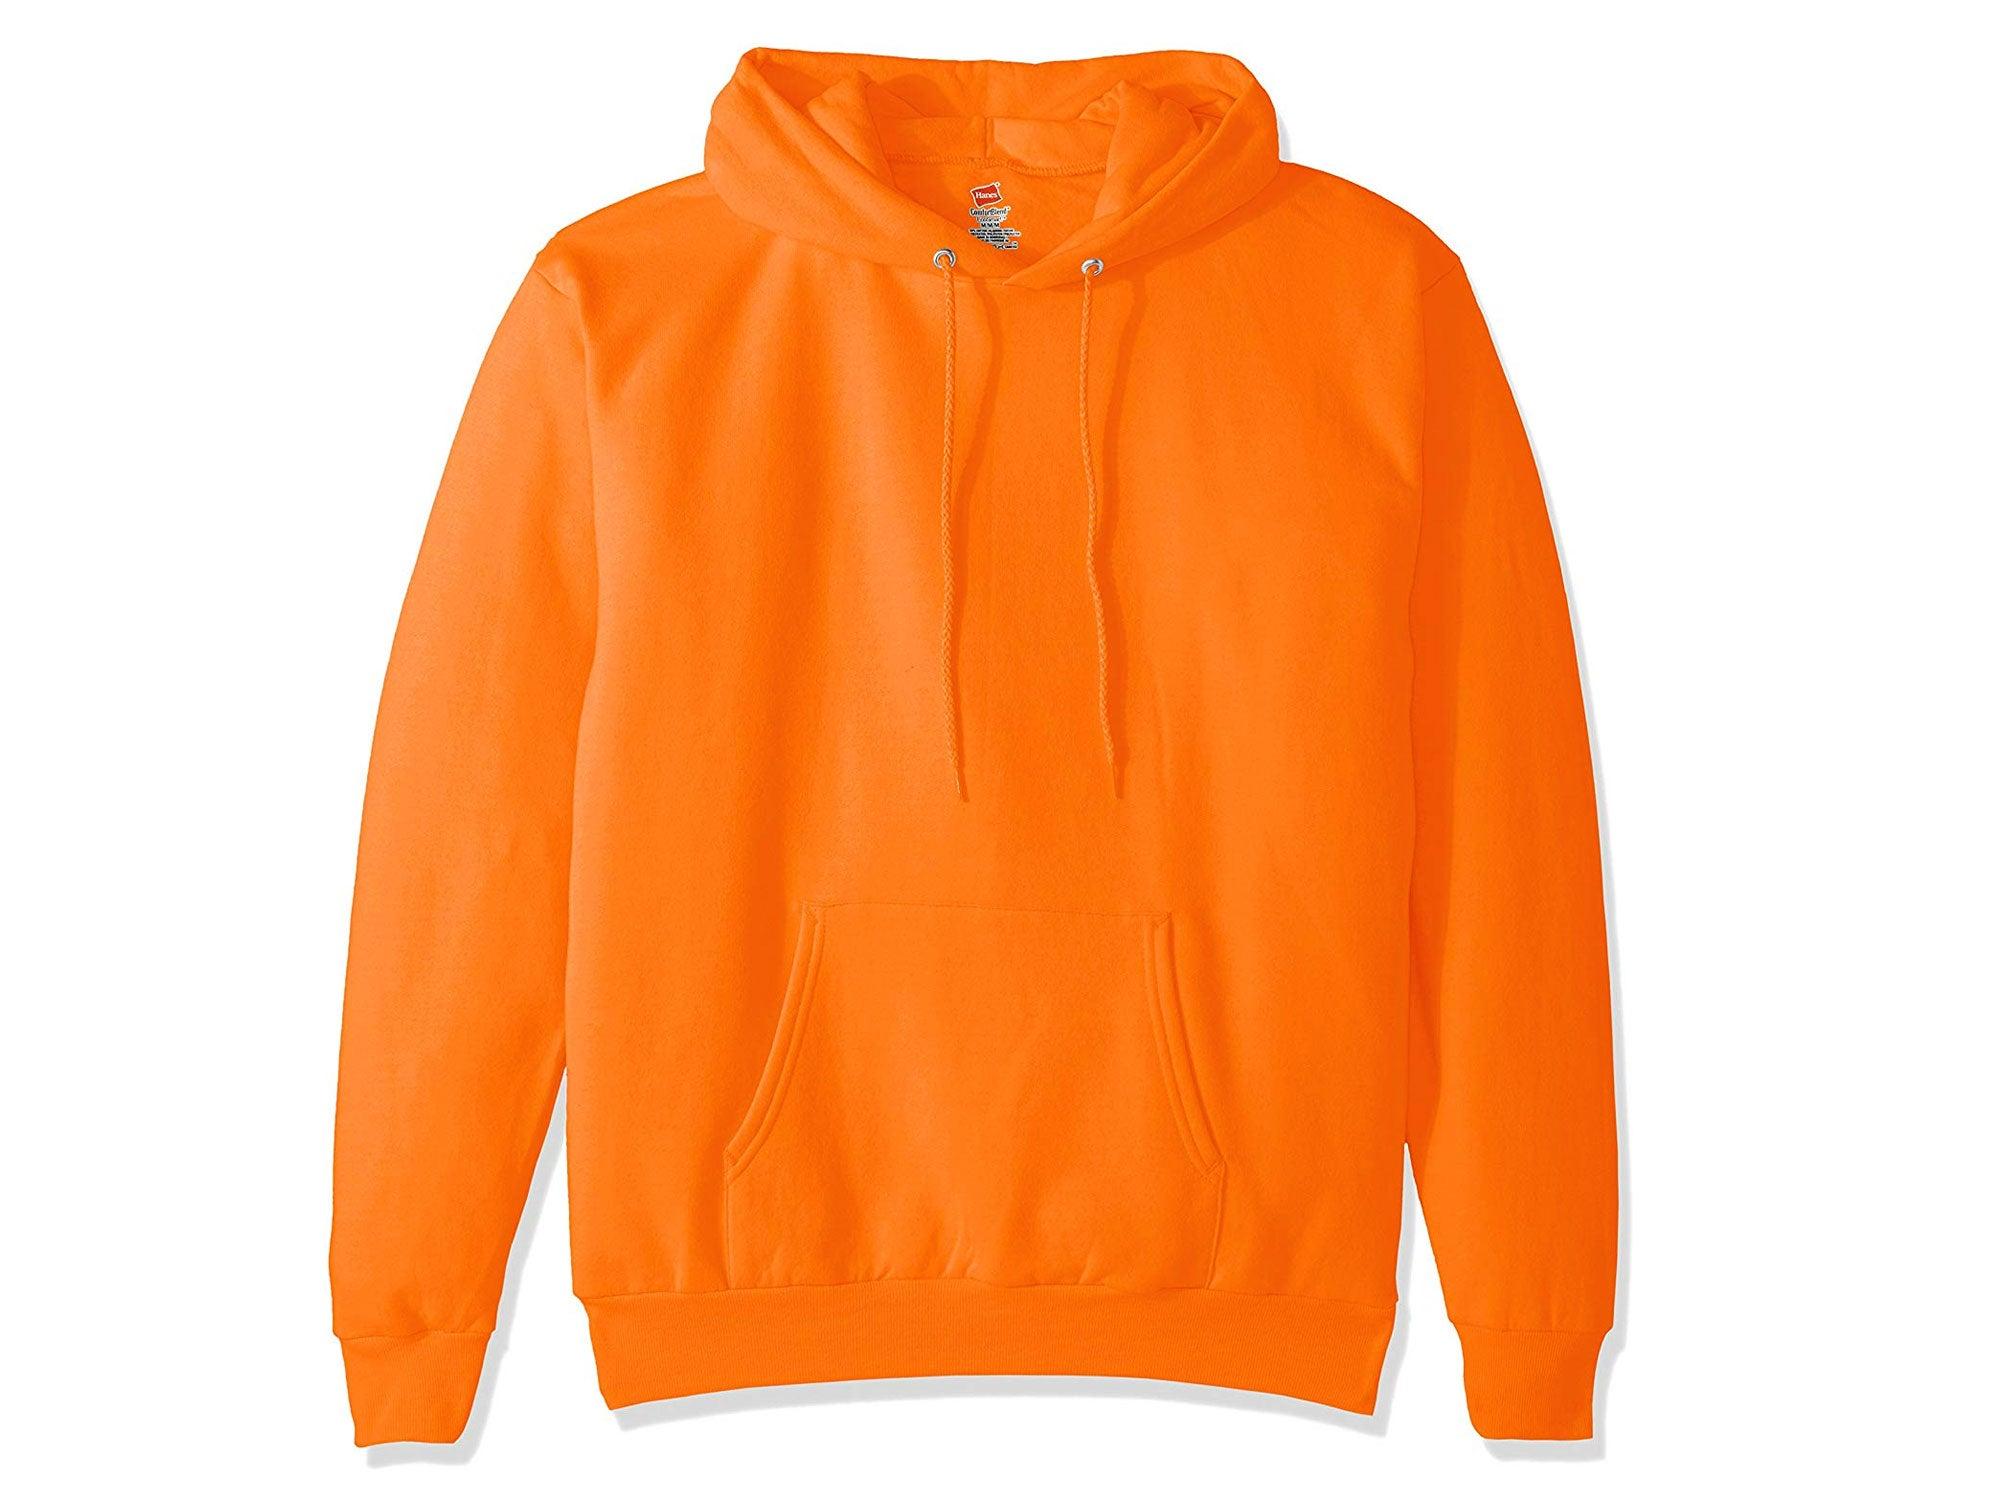 Hanes orange sweatshirt